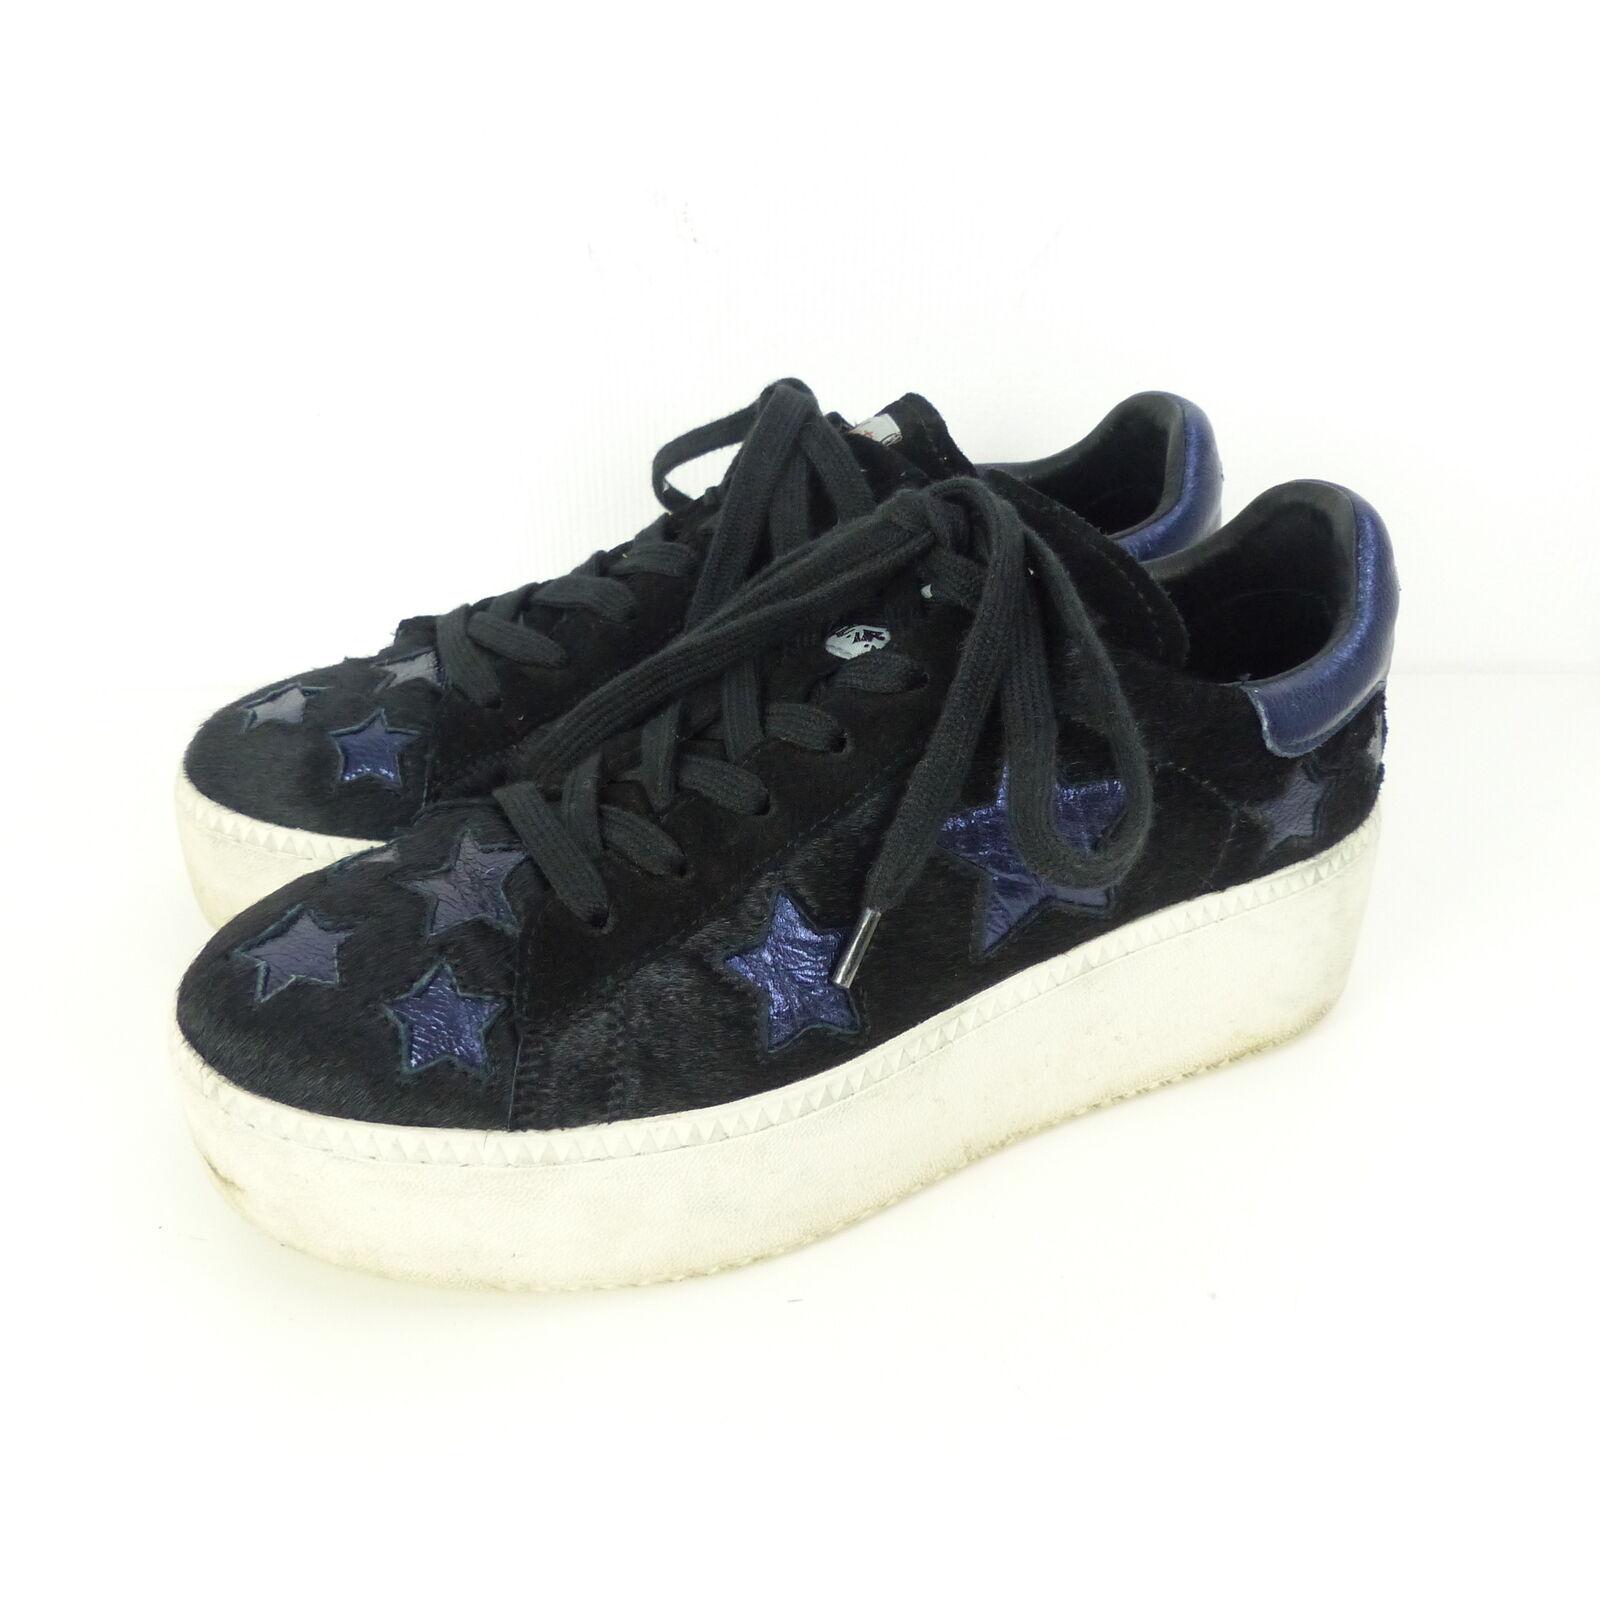 ASH Plateau Sneaker Cult Star Fell Stars Blau-Schwarz Gr. EUR 39 (K21)